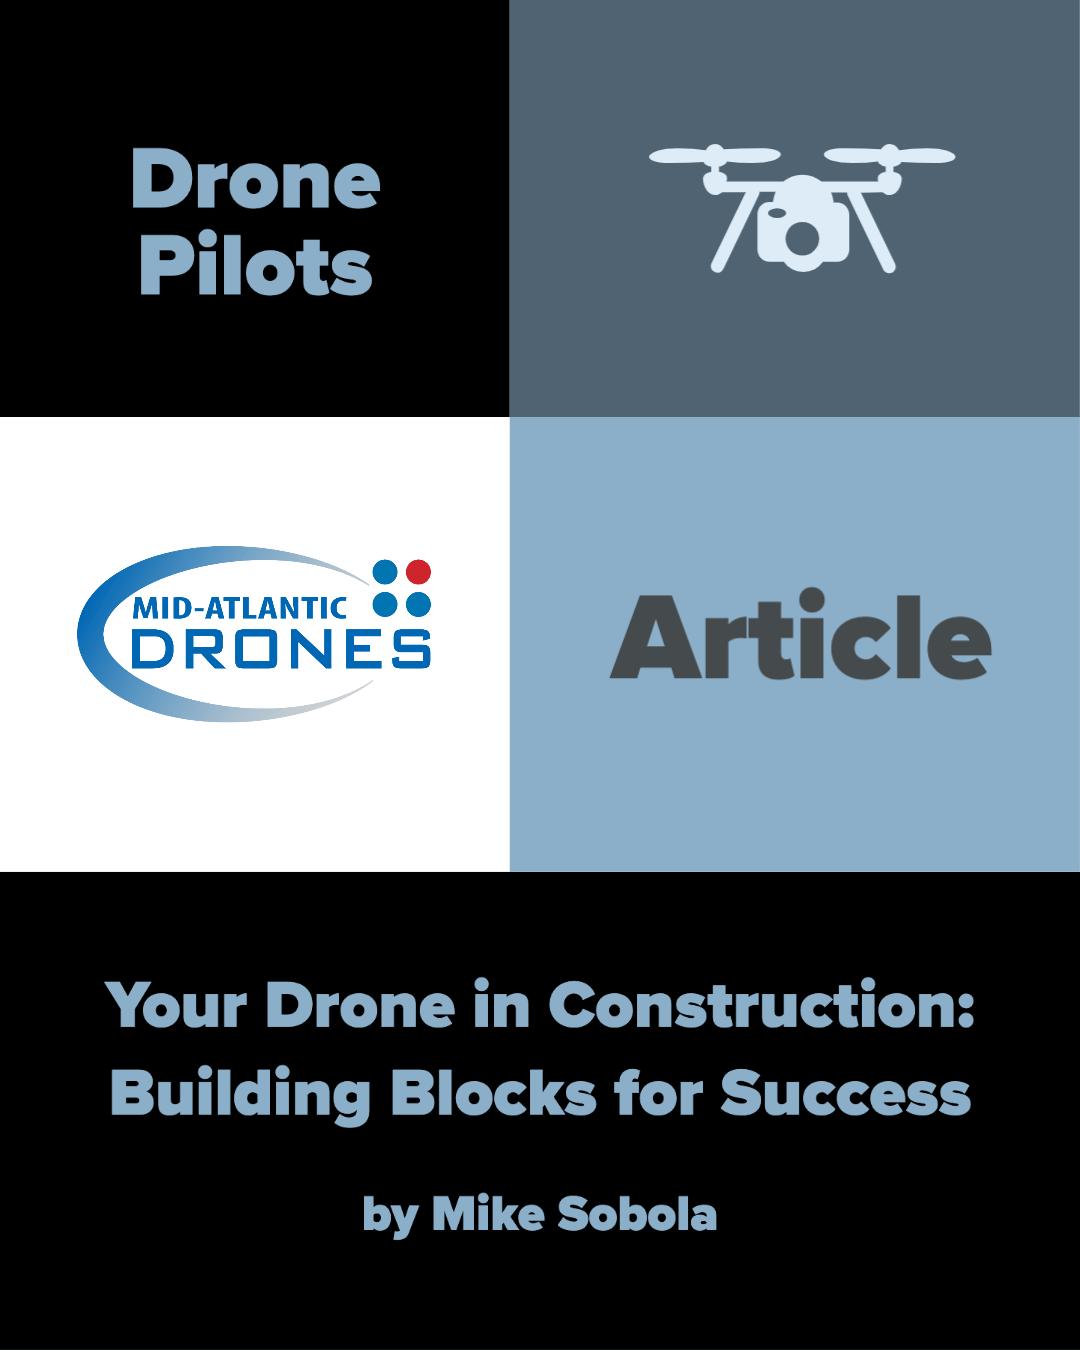 Building Blocks for Success